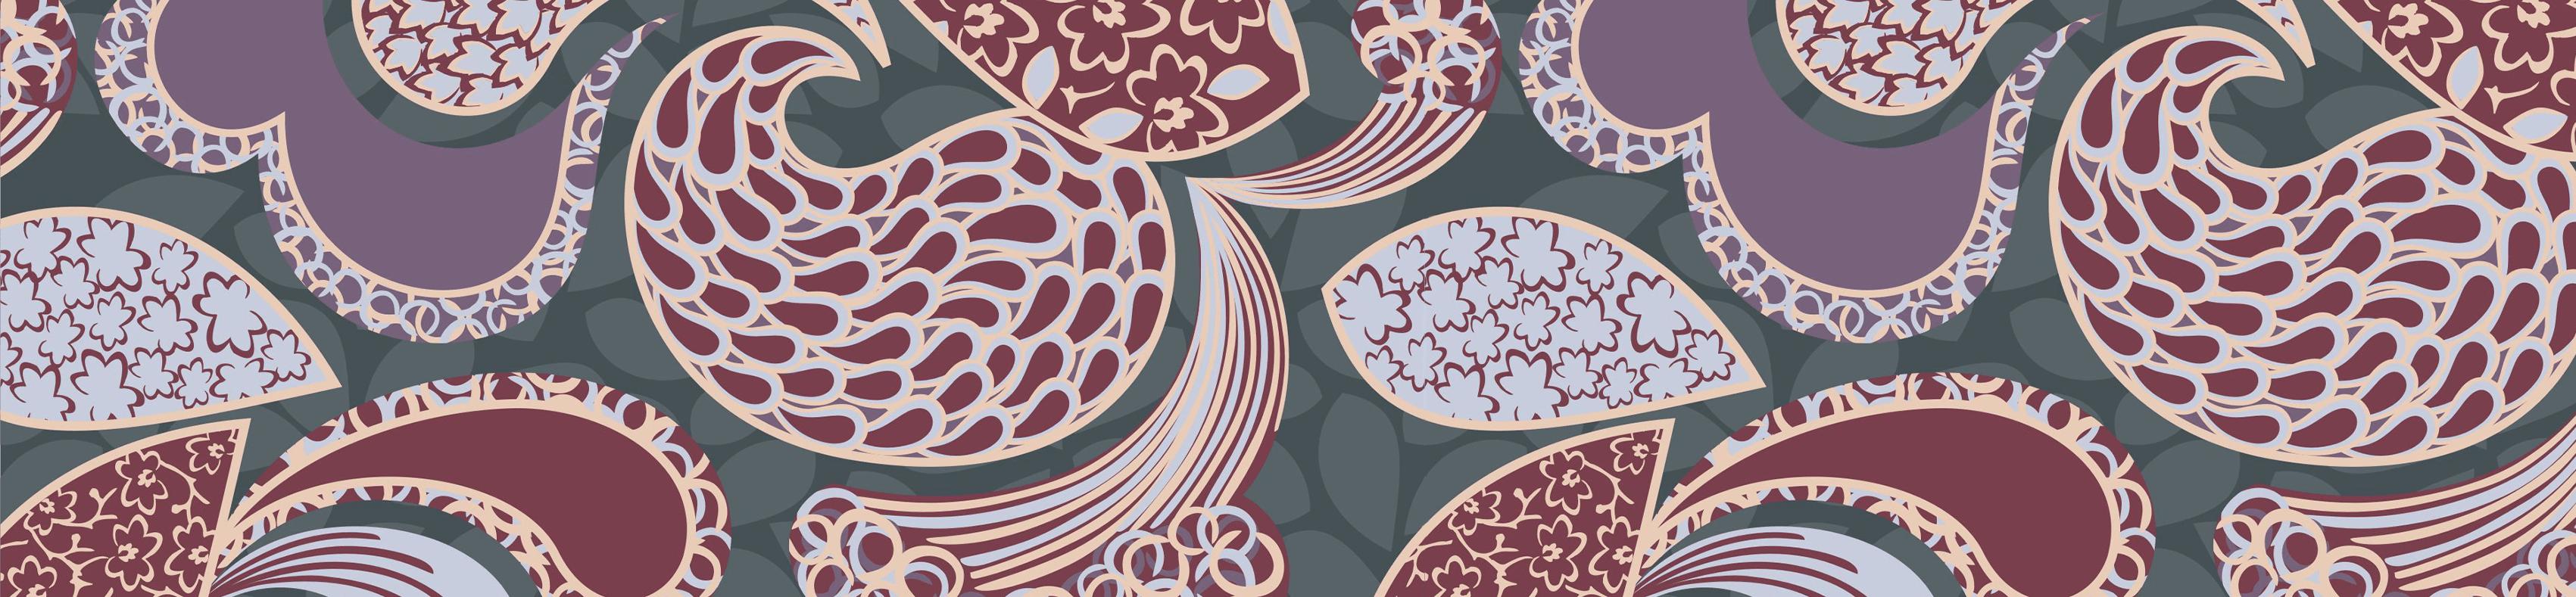 peacock-pattern